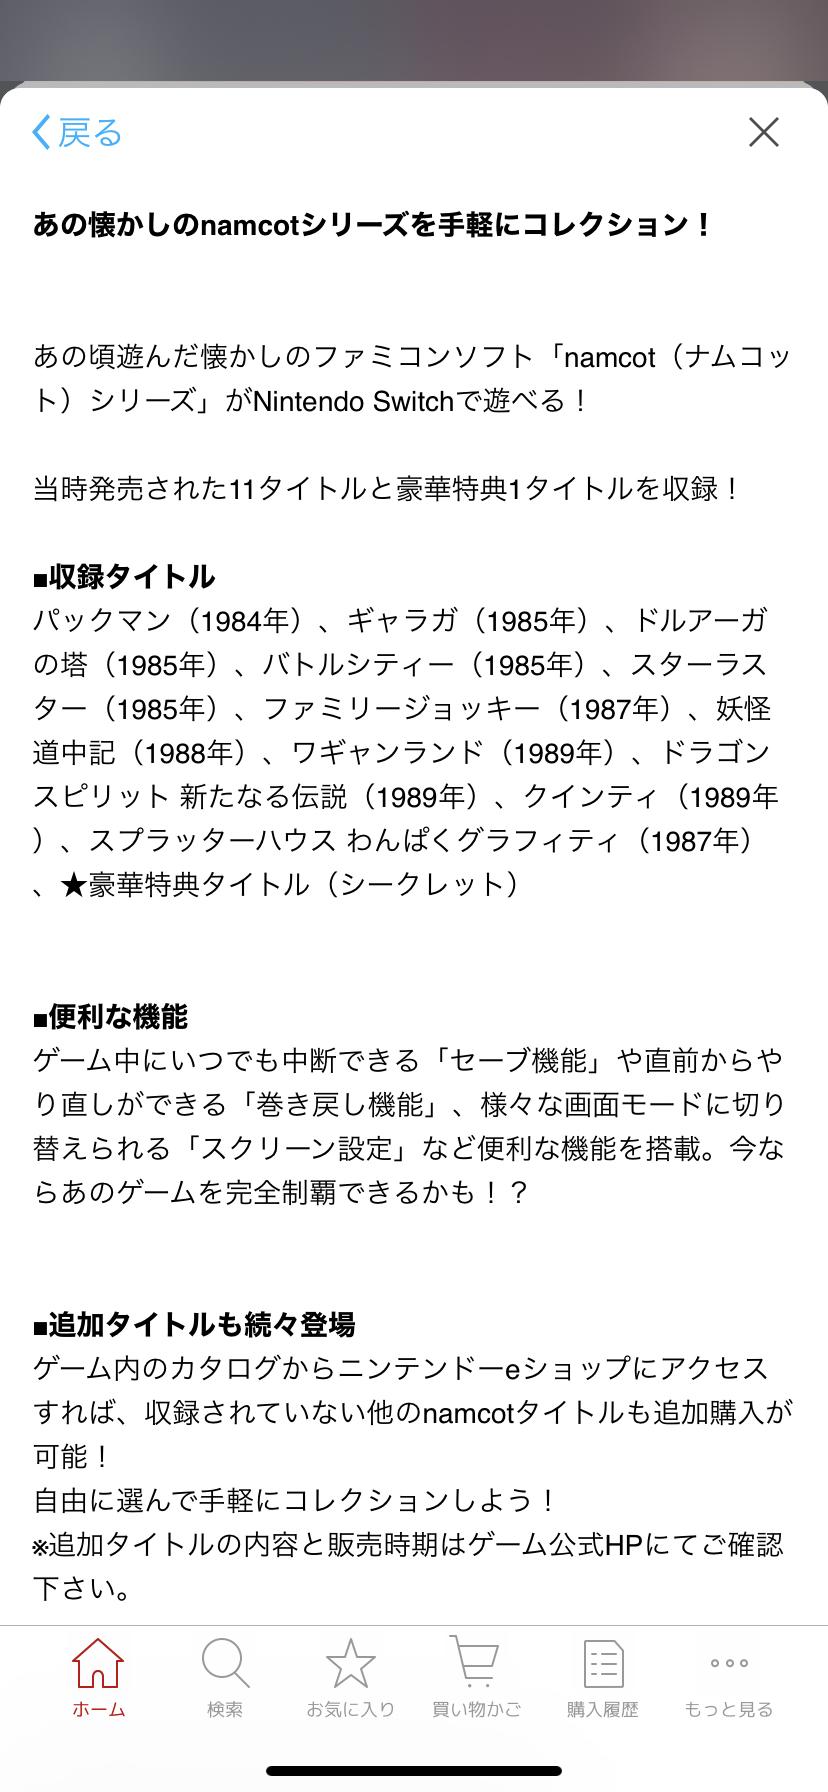 xbNE2Mq - 【朗報】Switch「ナムコットコレクション」、無料でワギャンランドを配信!ソフトは追加購入する形式に